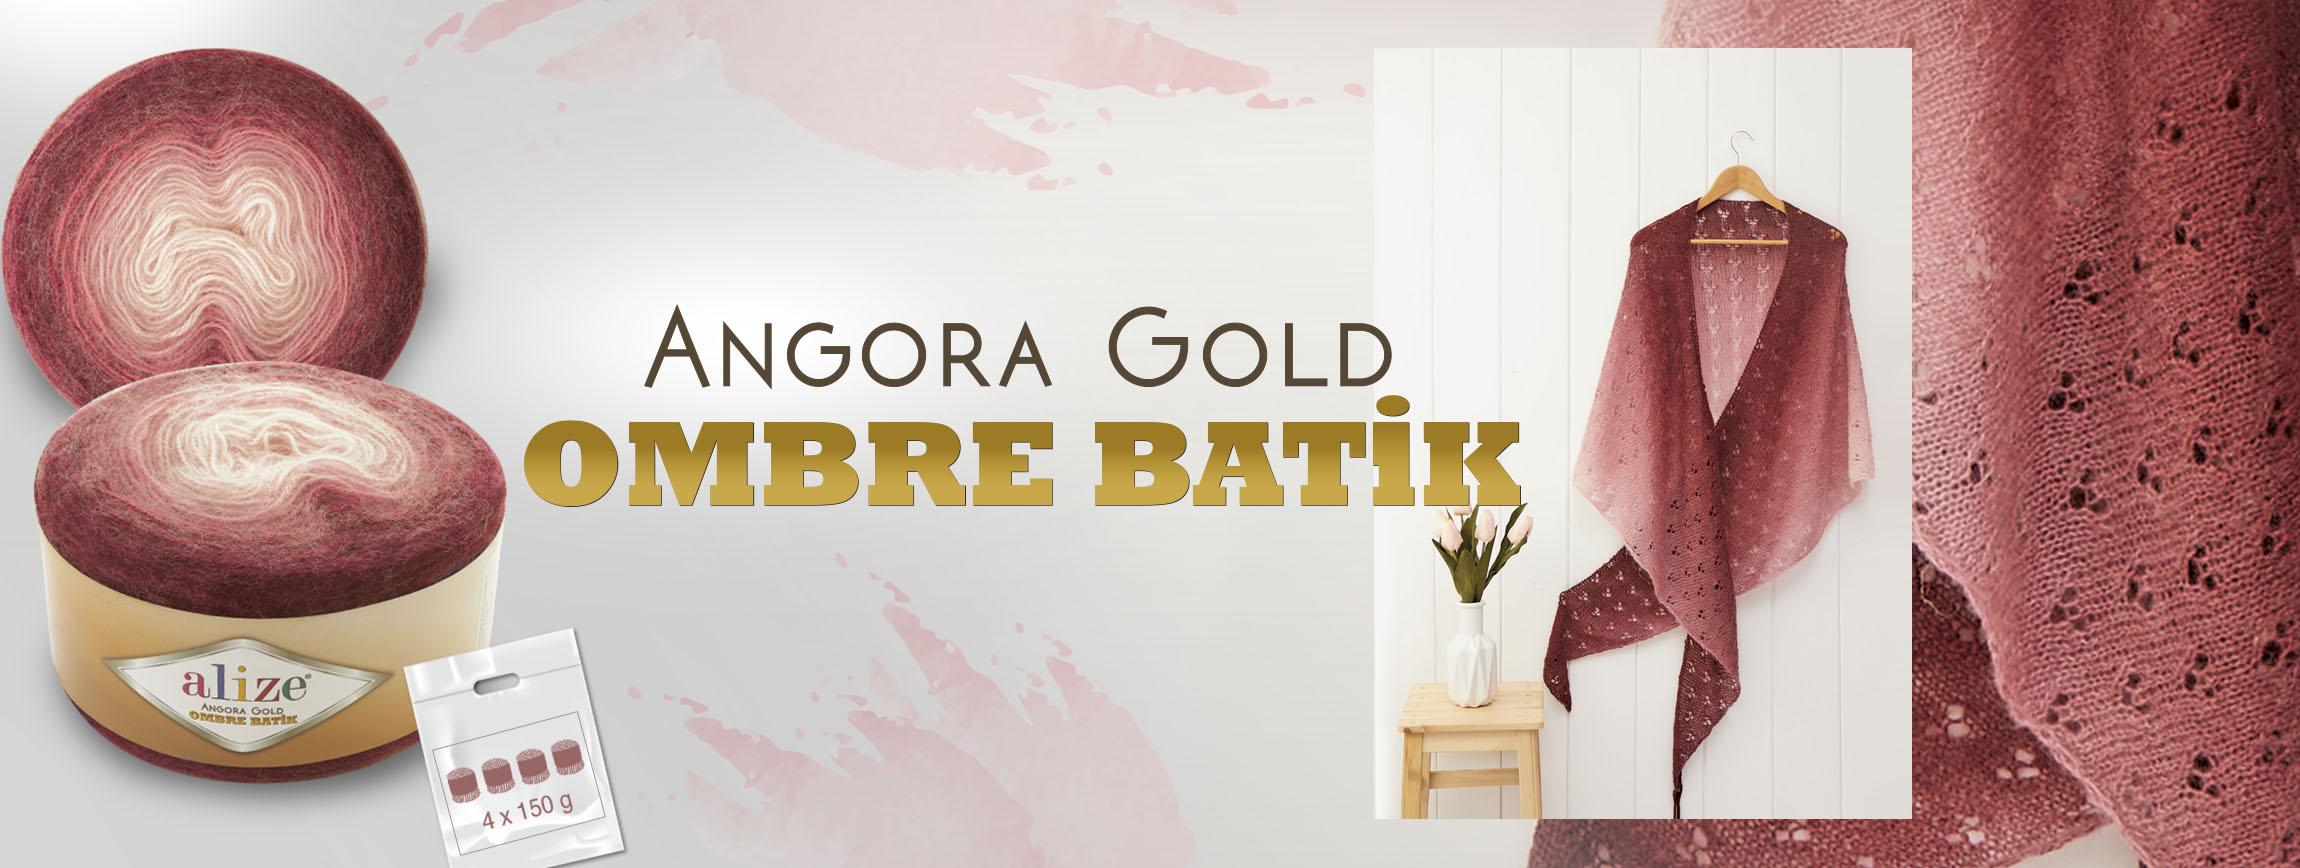 http://www.idejukrautuvele.lt/image//siulai/ALIZE-Angora%20gold-OMBRE%20BATIK/1568801675angora_gold_ombre_batik.jpg